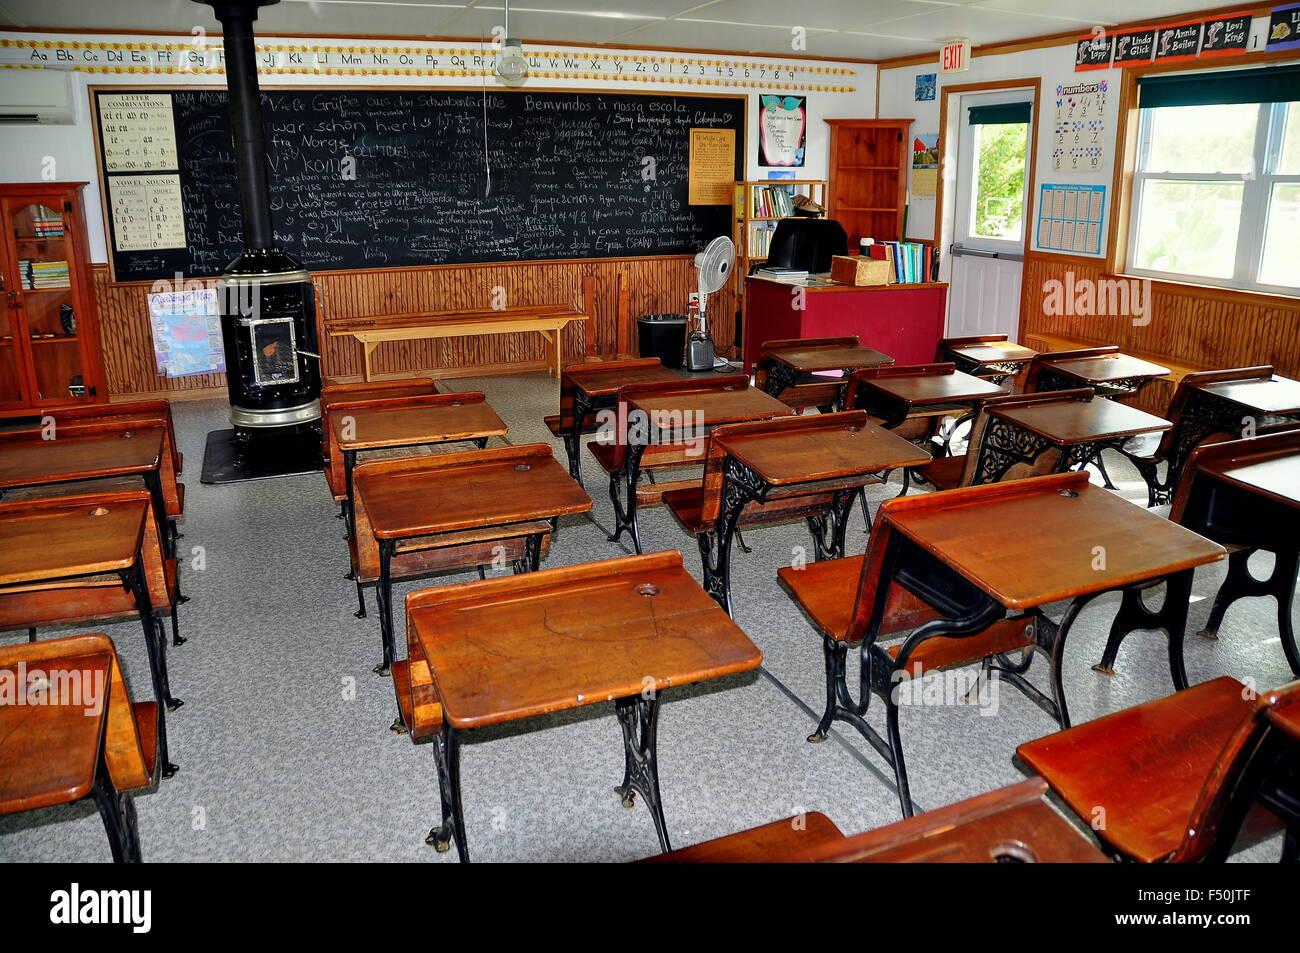 One Room Schoolhouse Interior Blackboard Stock Photos & One Room ...